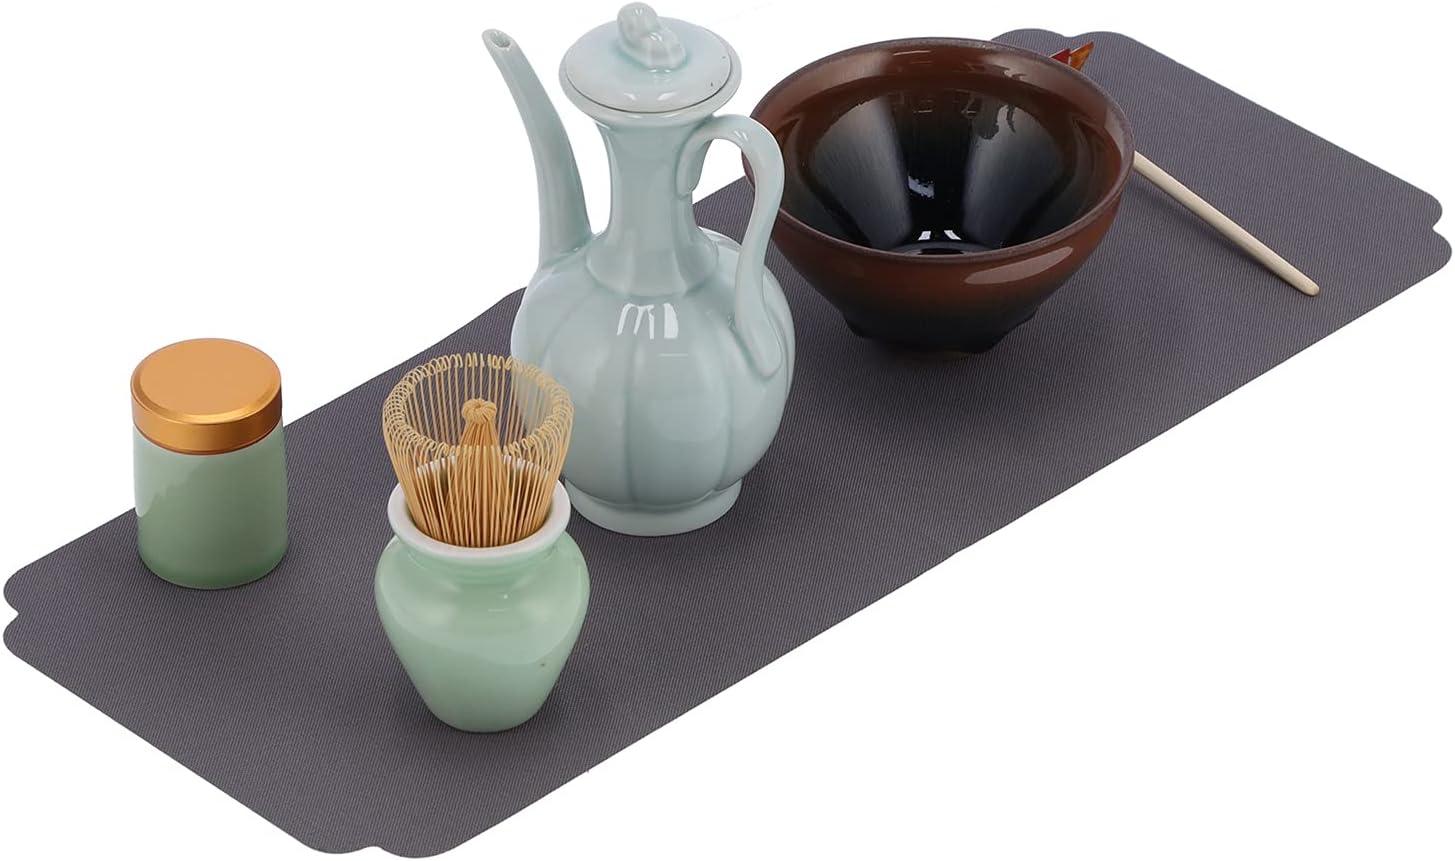 Eulbevoli Matcha Tea Set Whisk Bowl Classic Caddy New popularity